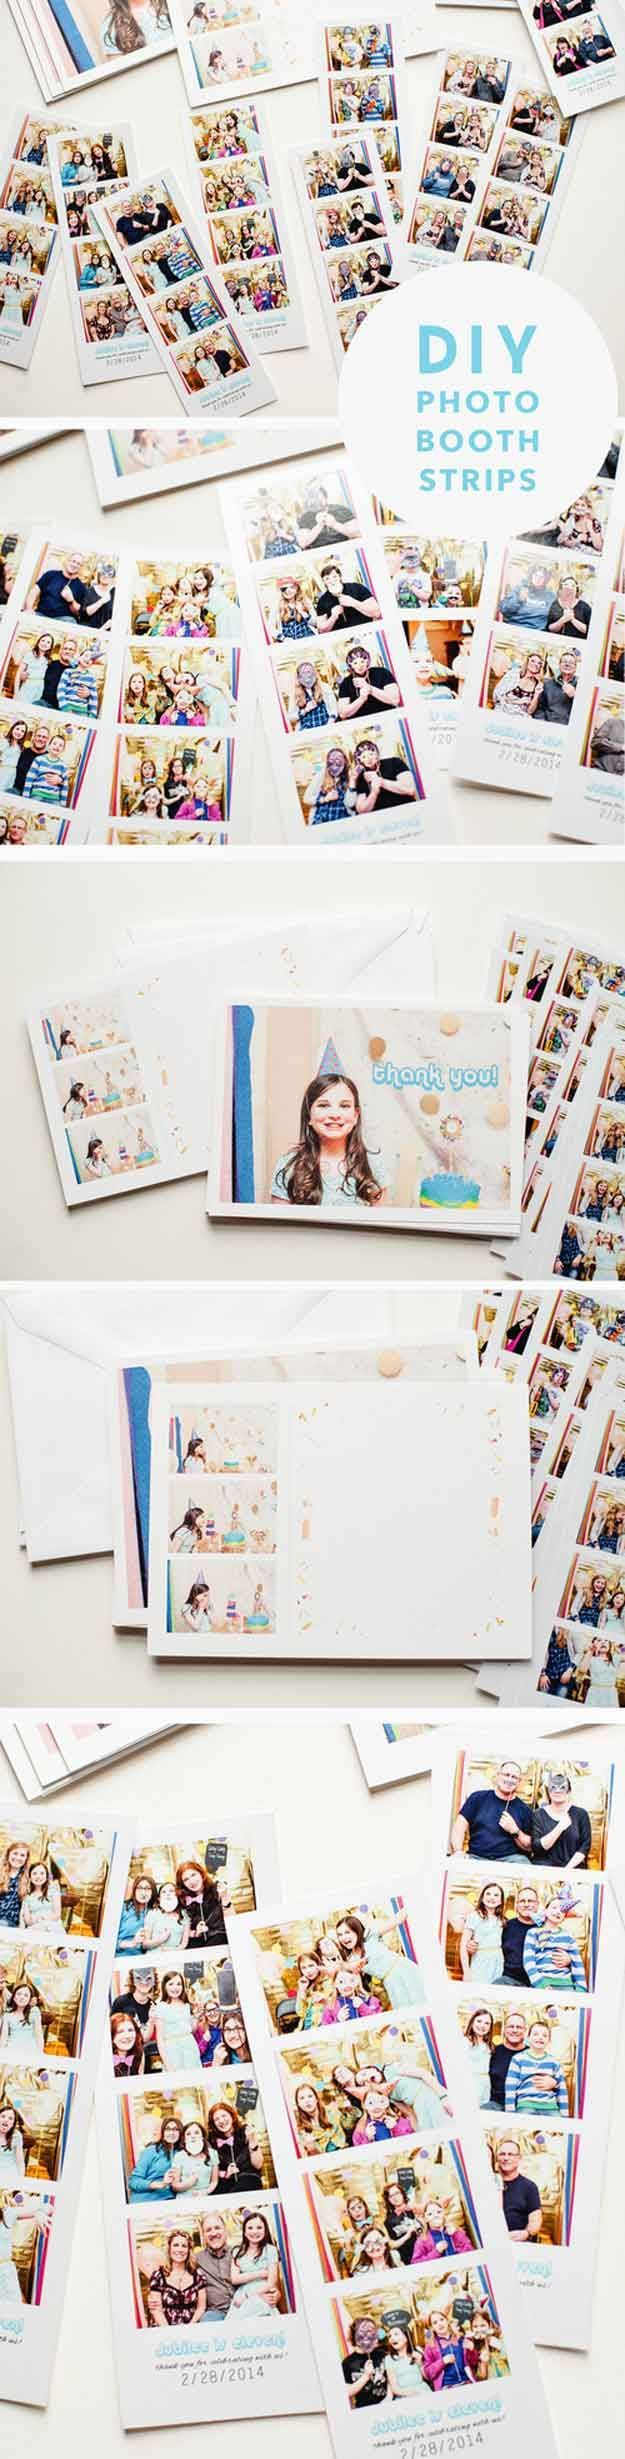 Easy DIY Photo Booth Ideas | DIY Photo Booth Strips by DIY Ready at http://diyready.com/20-diy-photo-booth-ideas/